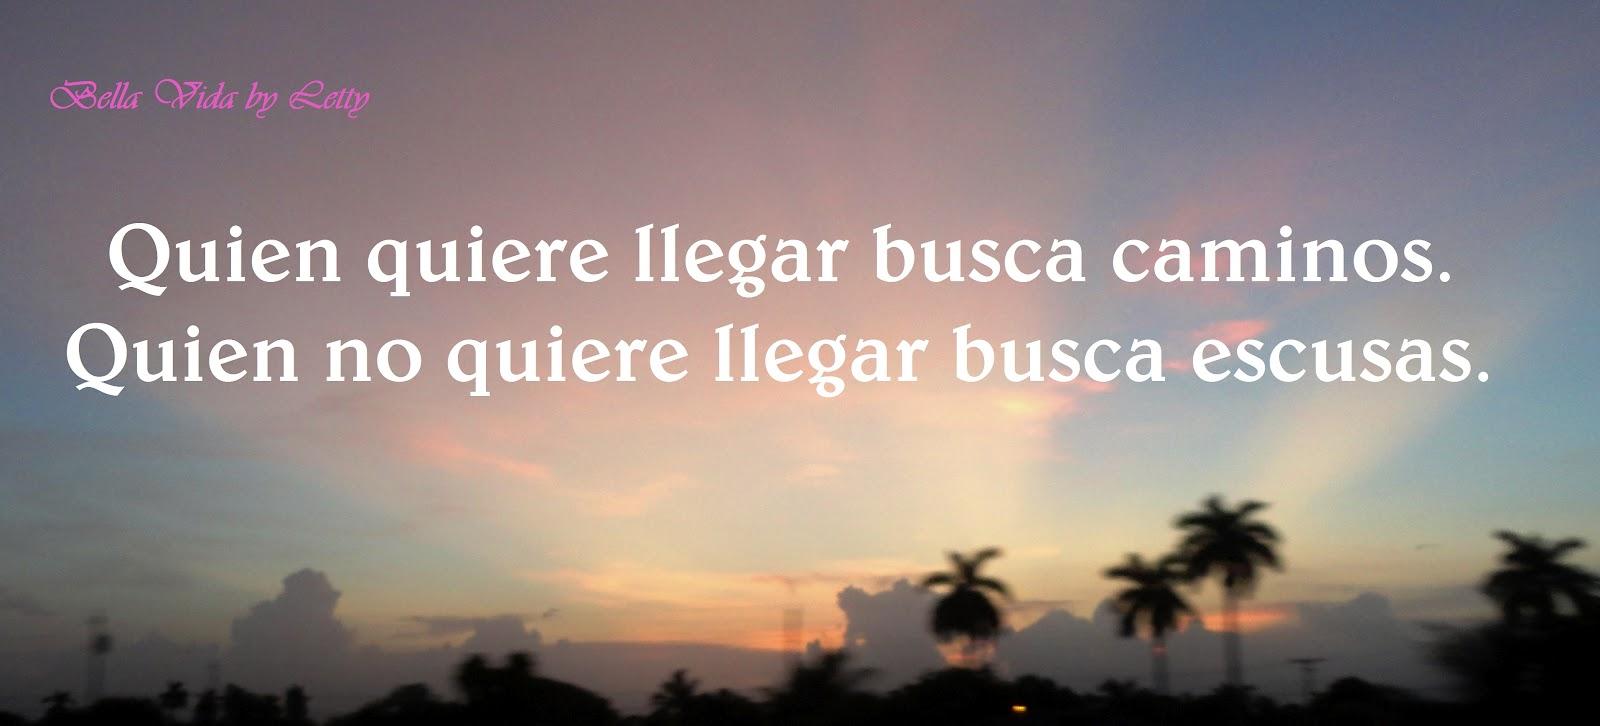 beautiful quotes tumblr in spanish - photo #34